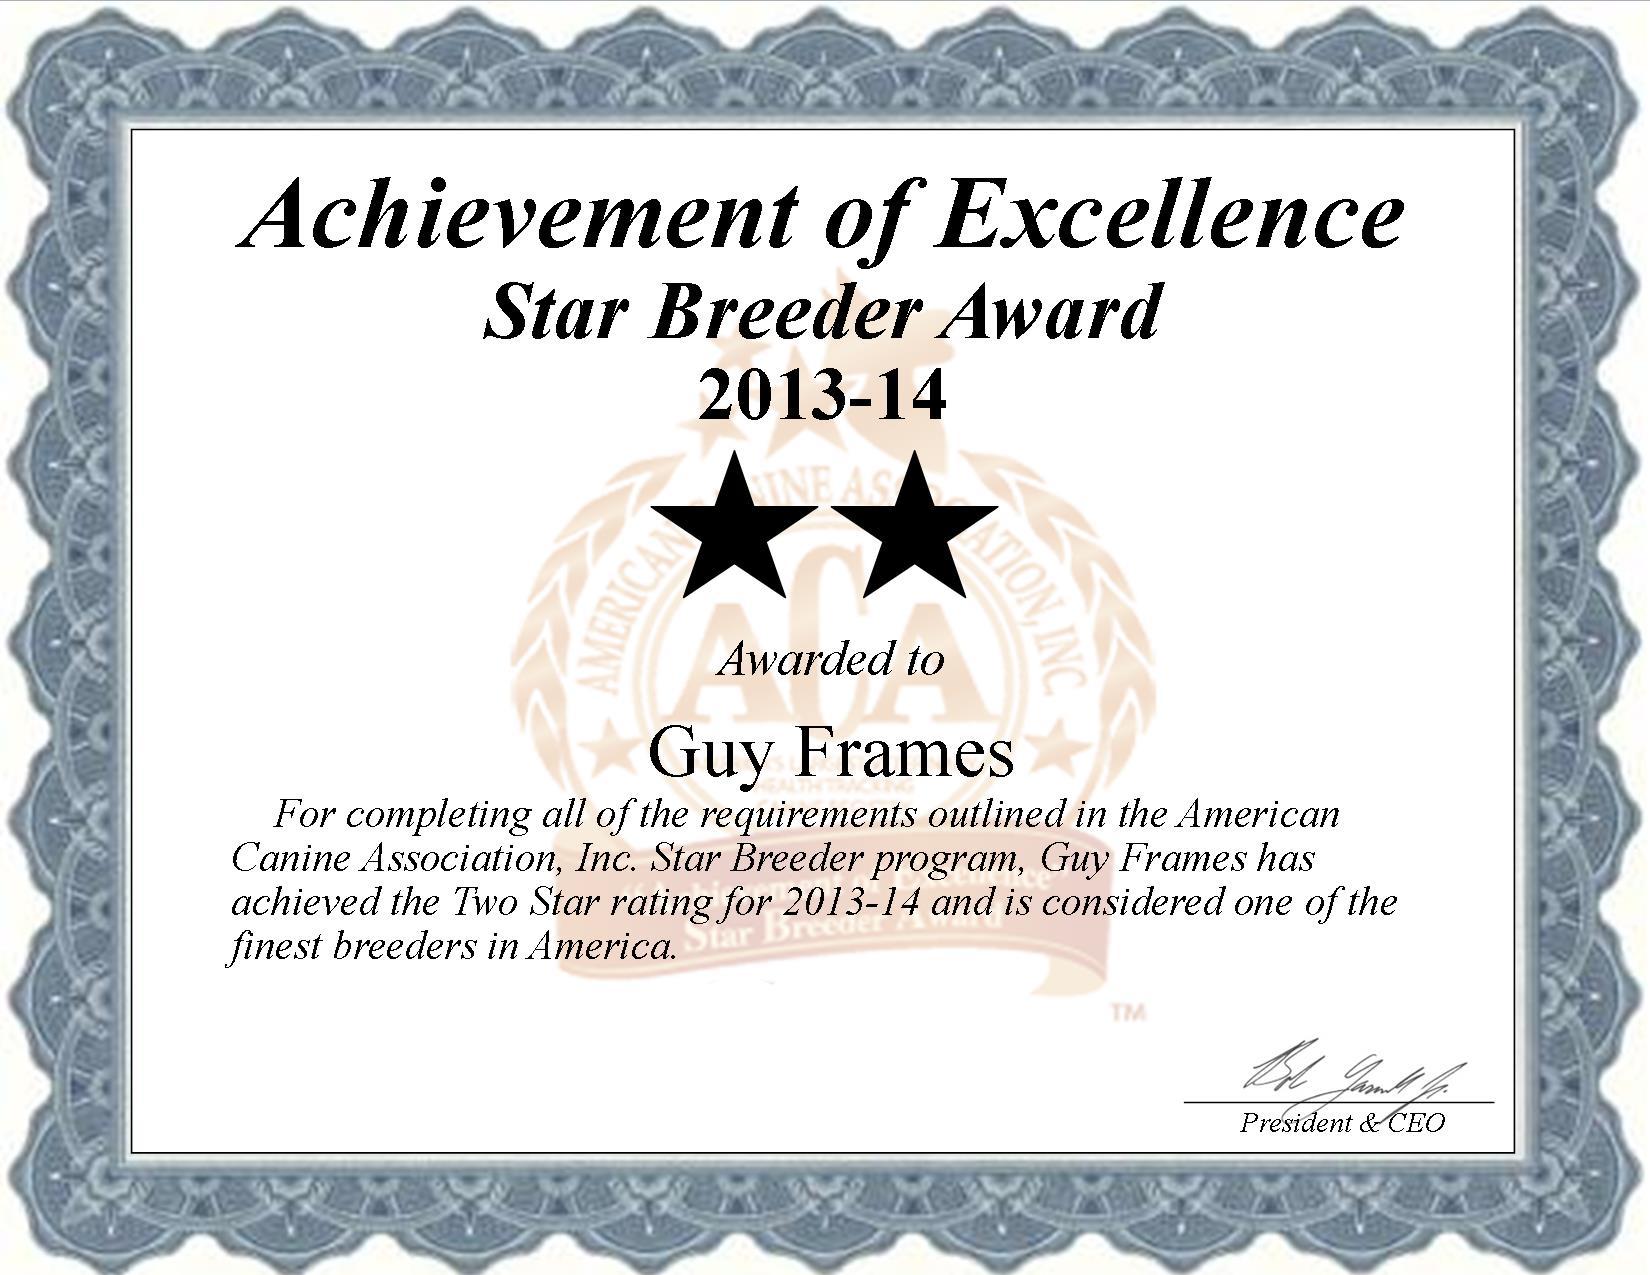 Guy Frames, Guy, Frames, Frames kennel, Guy Frames breeder, Antlers, OK, Oklahoma, Antlers OK, breeder, star breeder, 5 star breeders,  starbreeder, starbreeders, 2 star, dog,  puppy, puppies